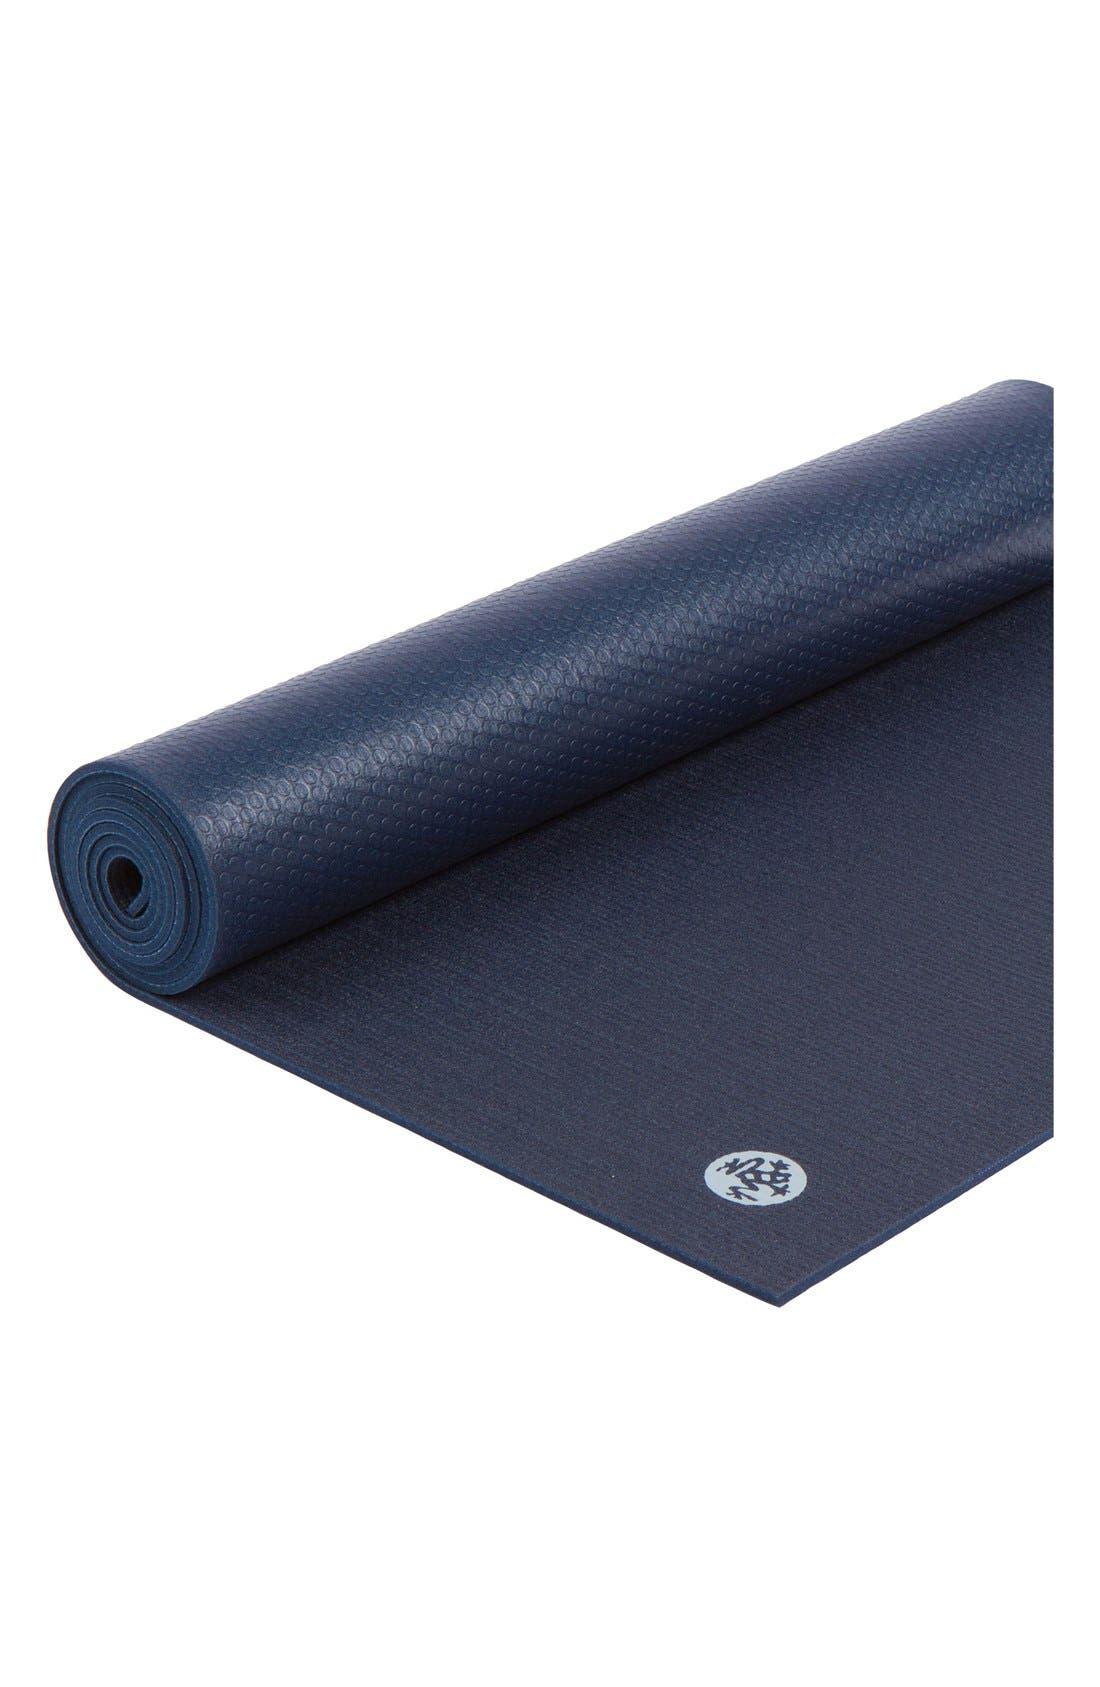 'ProLite' Yoga Mat,                             Alternate thumbnail 3, color,                             Midnight